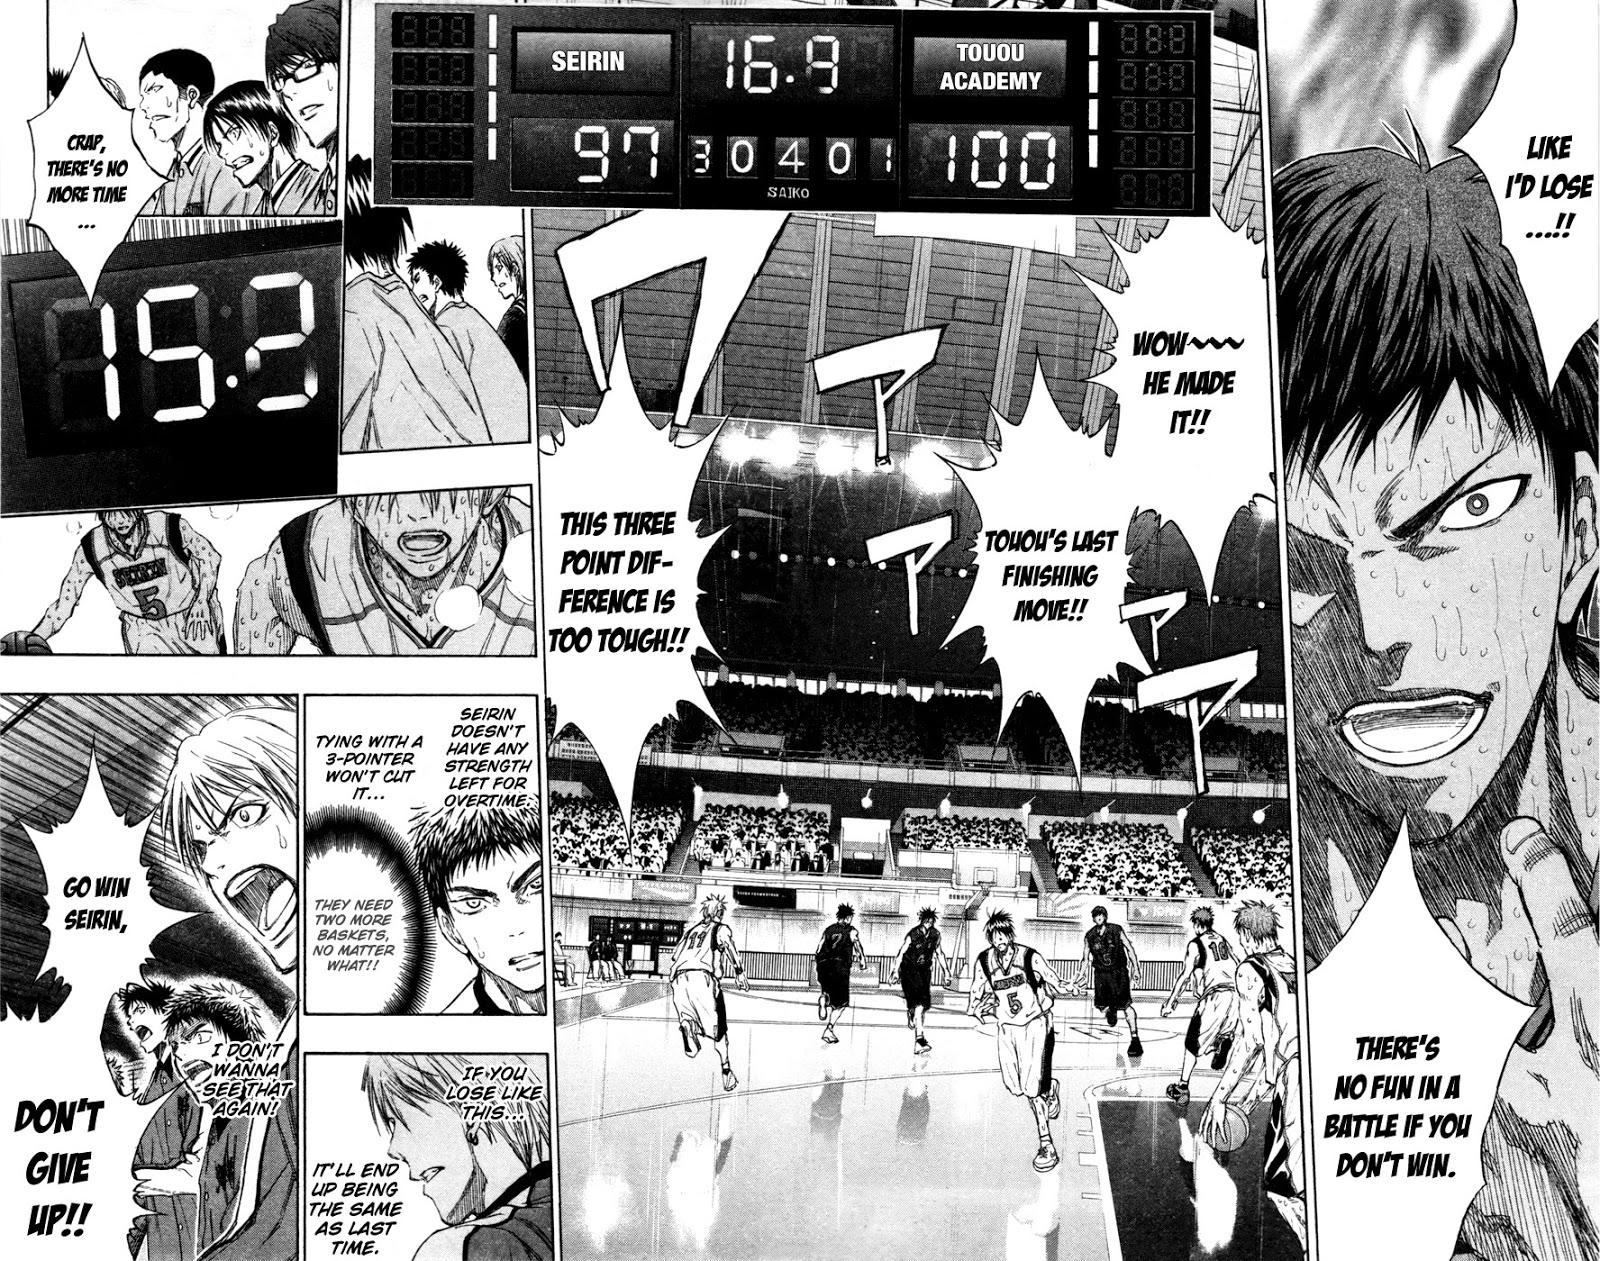 Kuroko no Basket Manga Chapter 137 - Image 10-11